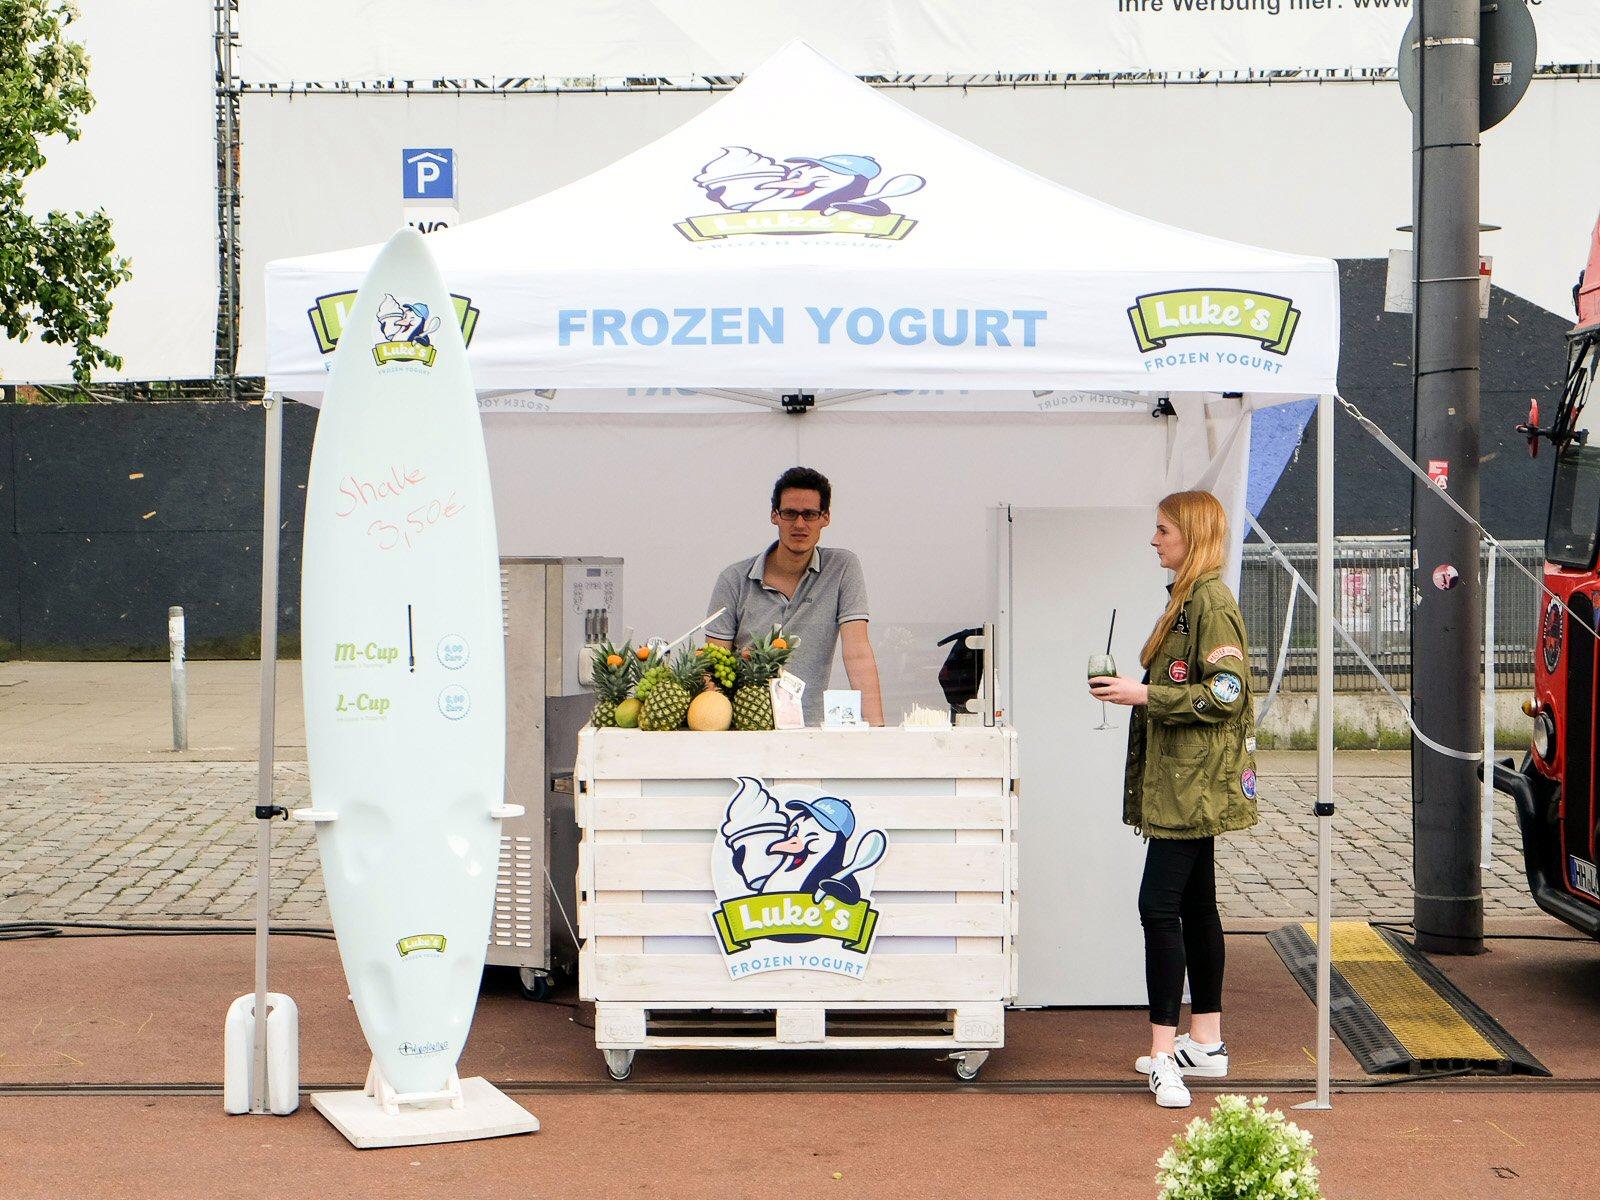 Frozen joghurt hamburg